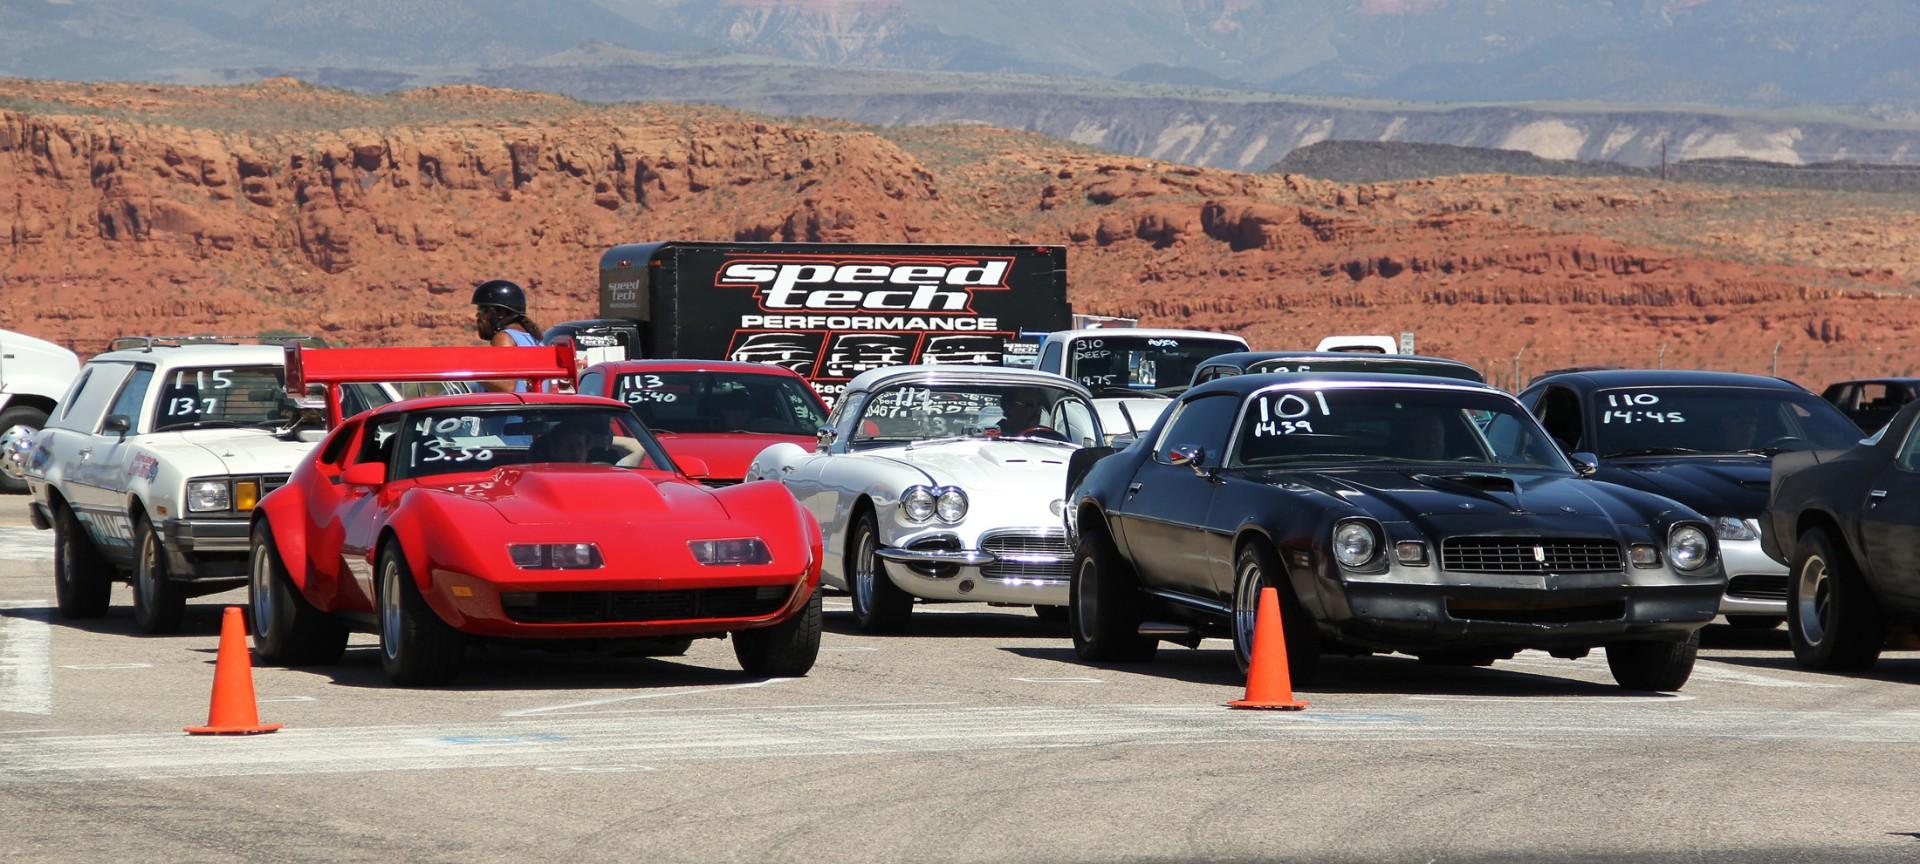 Drag racing at Ridge Top Complex,  St. George, Utah, Sept. 22, 2013 | Photo by John Teas, St. George News